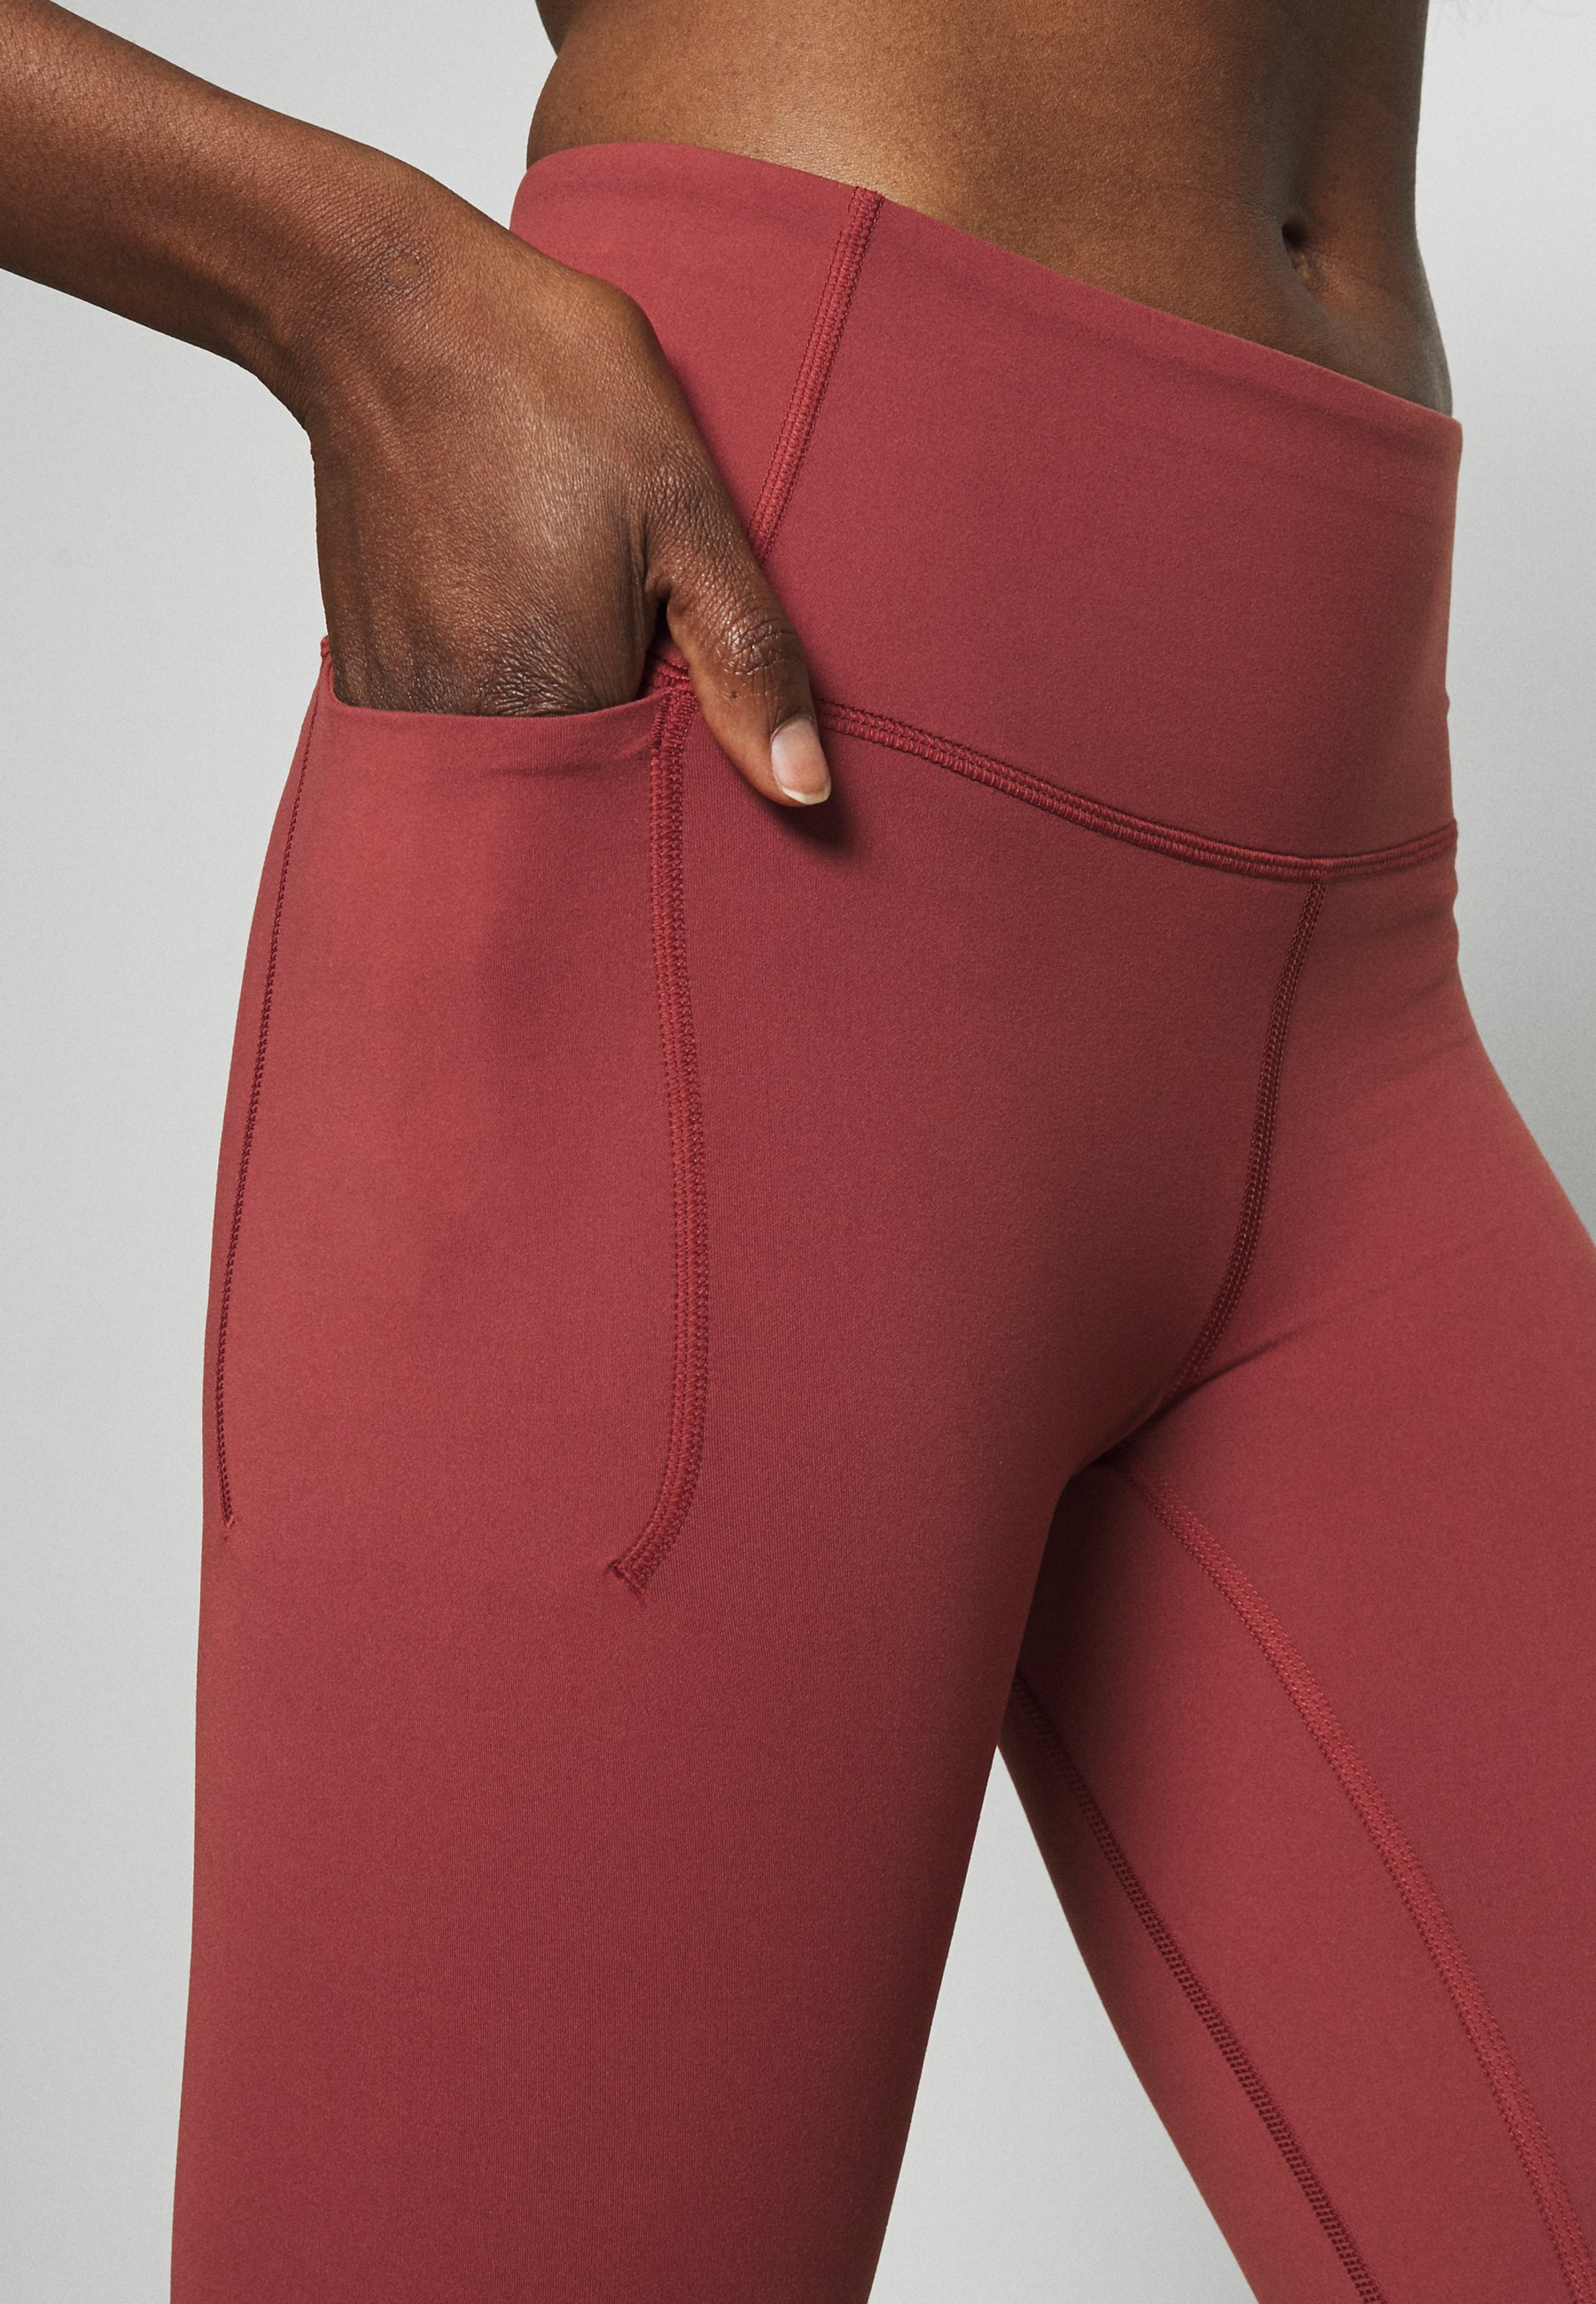 Under Armour UA MERIDIAN LEGGINGS - Leggings - cinna red 4przI